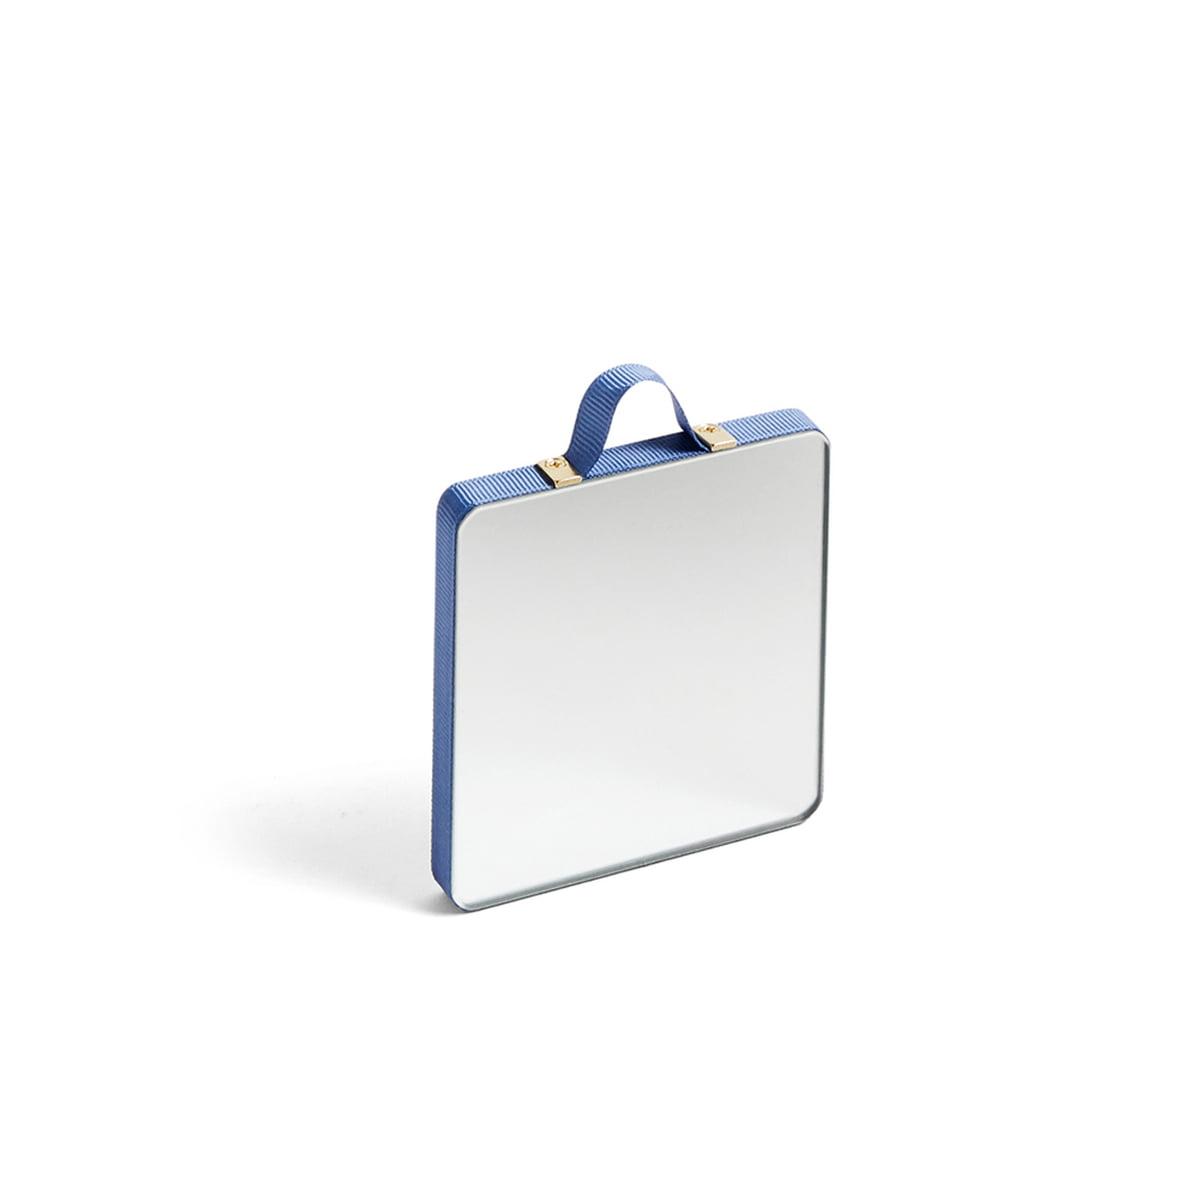 HAY - Ruban Spiegel Square XS, blau